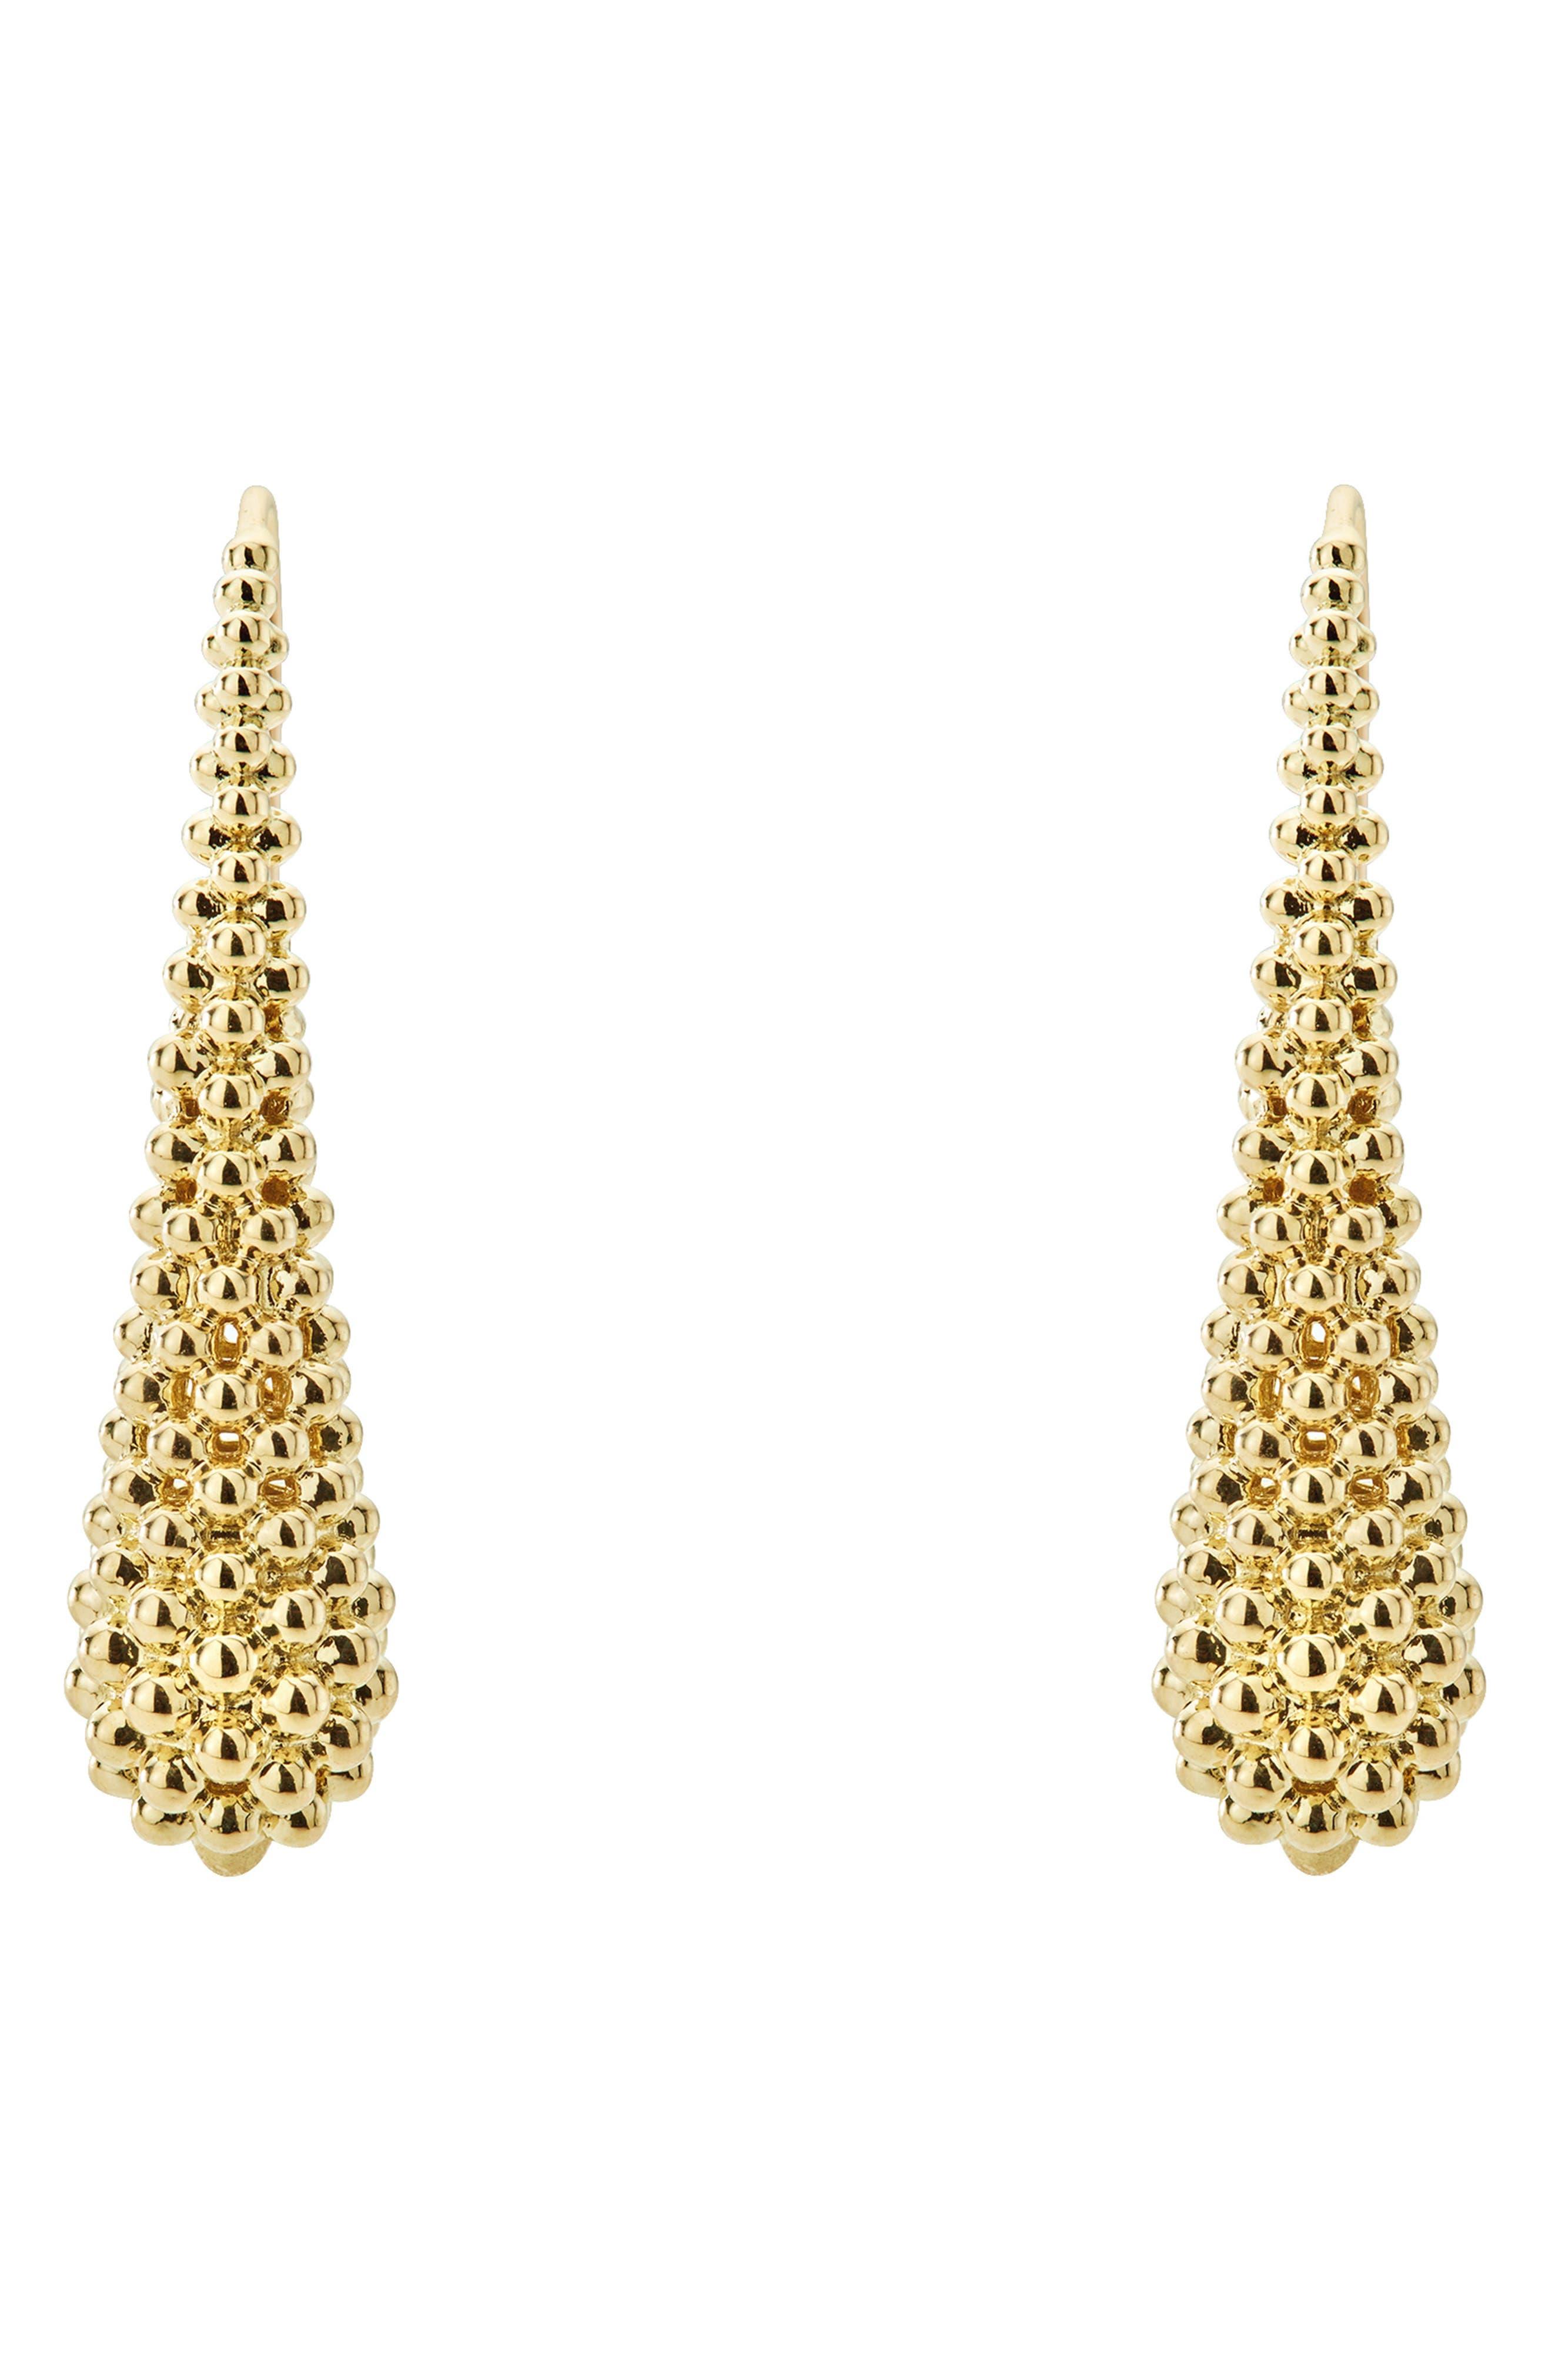 Caviar Gold Teardrop Earrings,                             Alternate thumbnail 3, color,                             GOLD